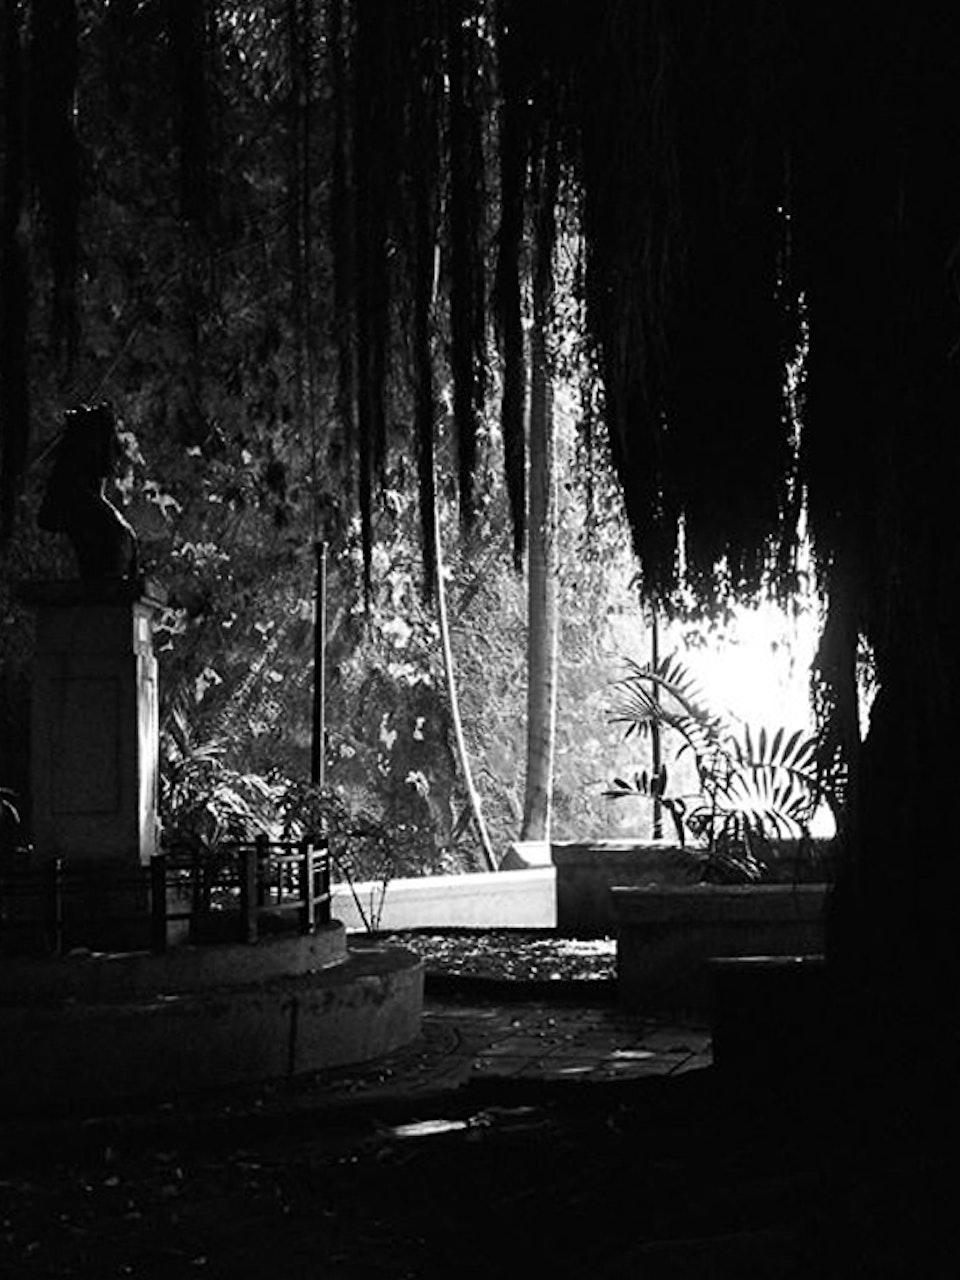 Black and White Film - San Juan, Puerto Rico